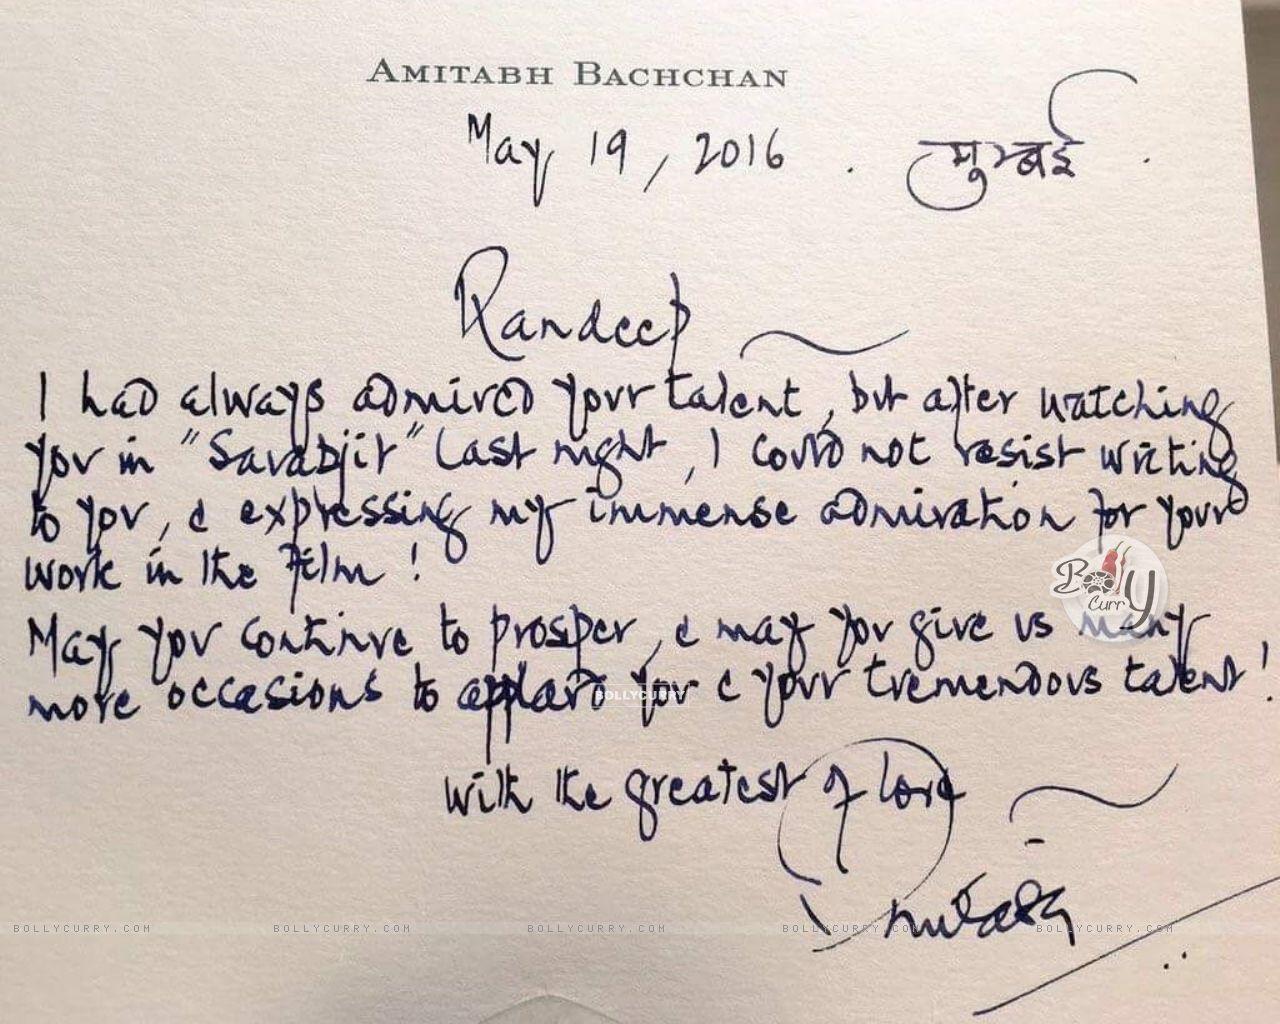 Amitabh Bachchan's letter to Randeep Hooda for Sarabjit's Success! (406642) size:1280x1024